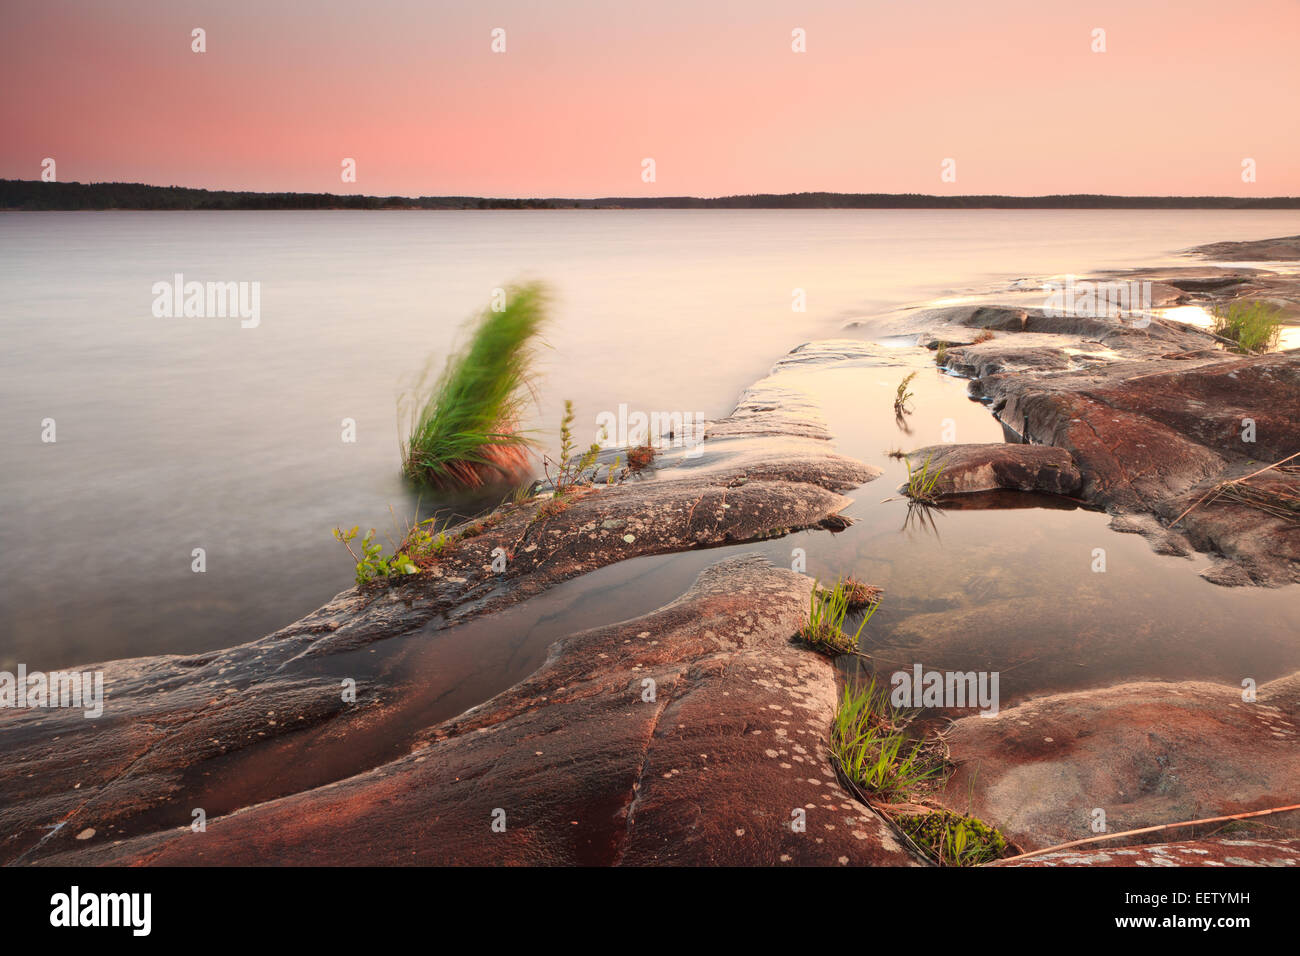 Sommer Landschaft auf der Insel Brattholmen in den See Vansjø, Råde Kommune, Østfold Fylke, Norwegen. Stockbild